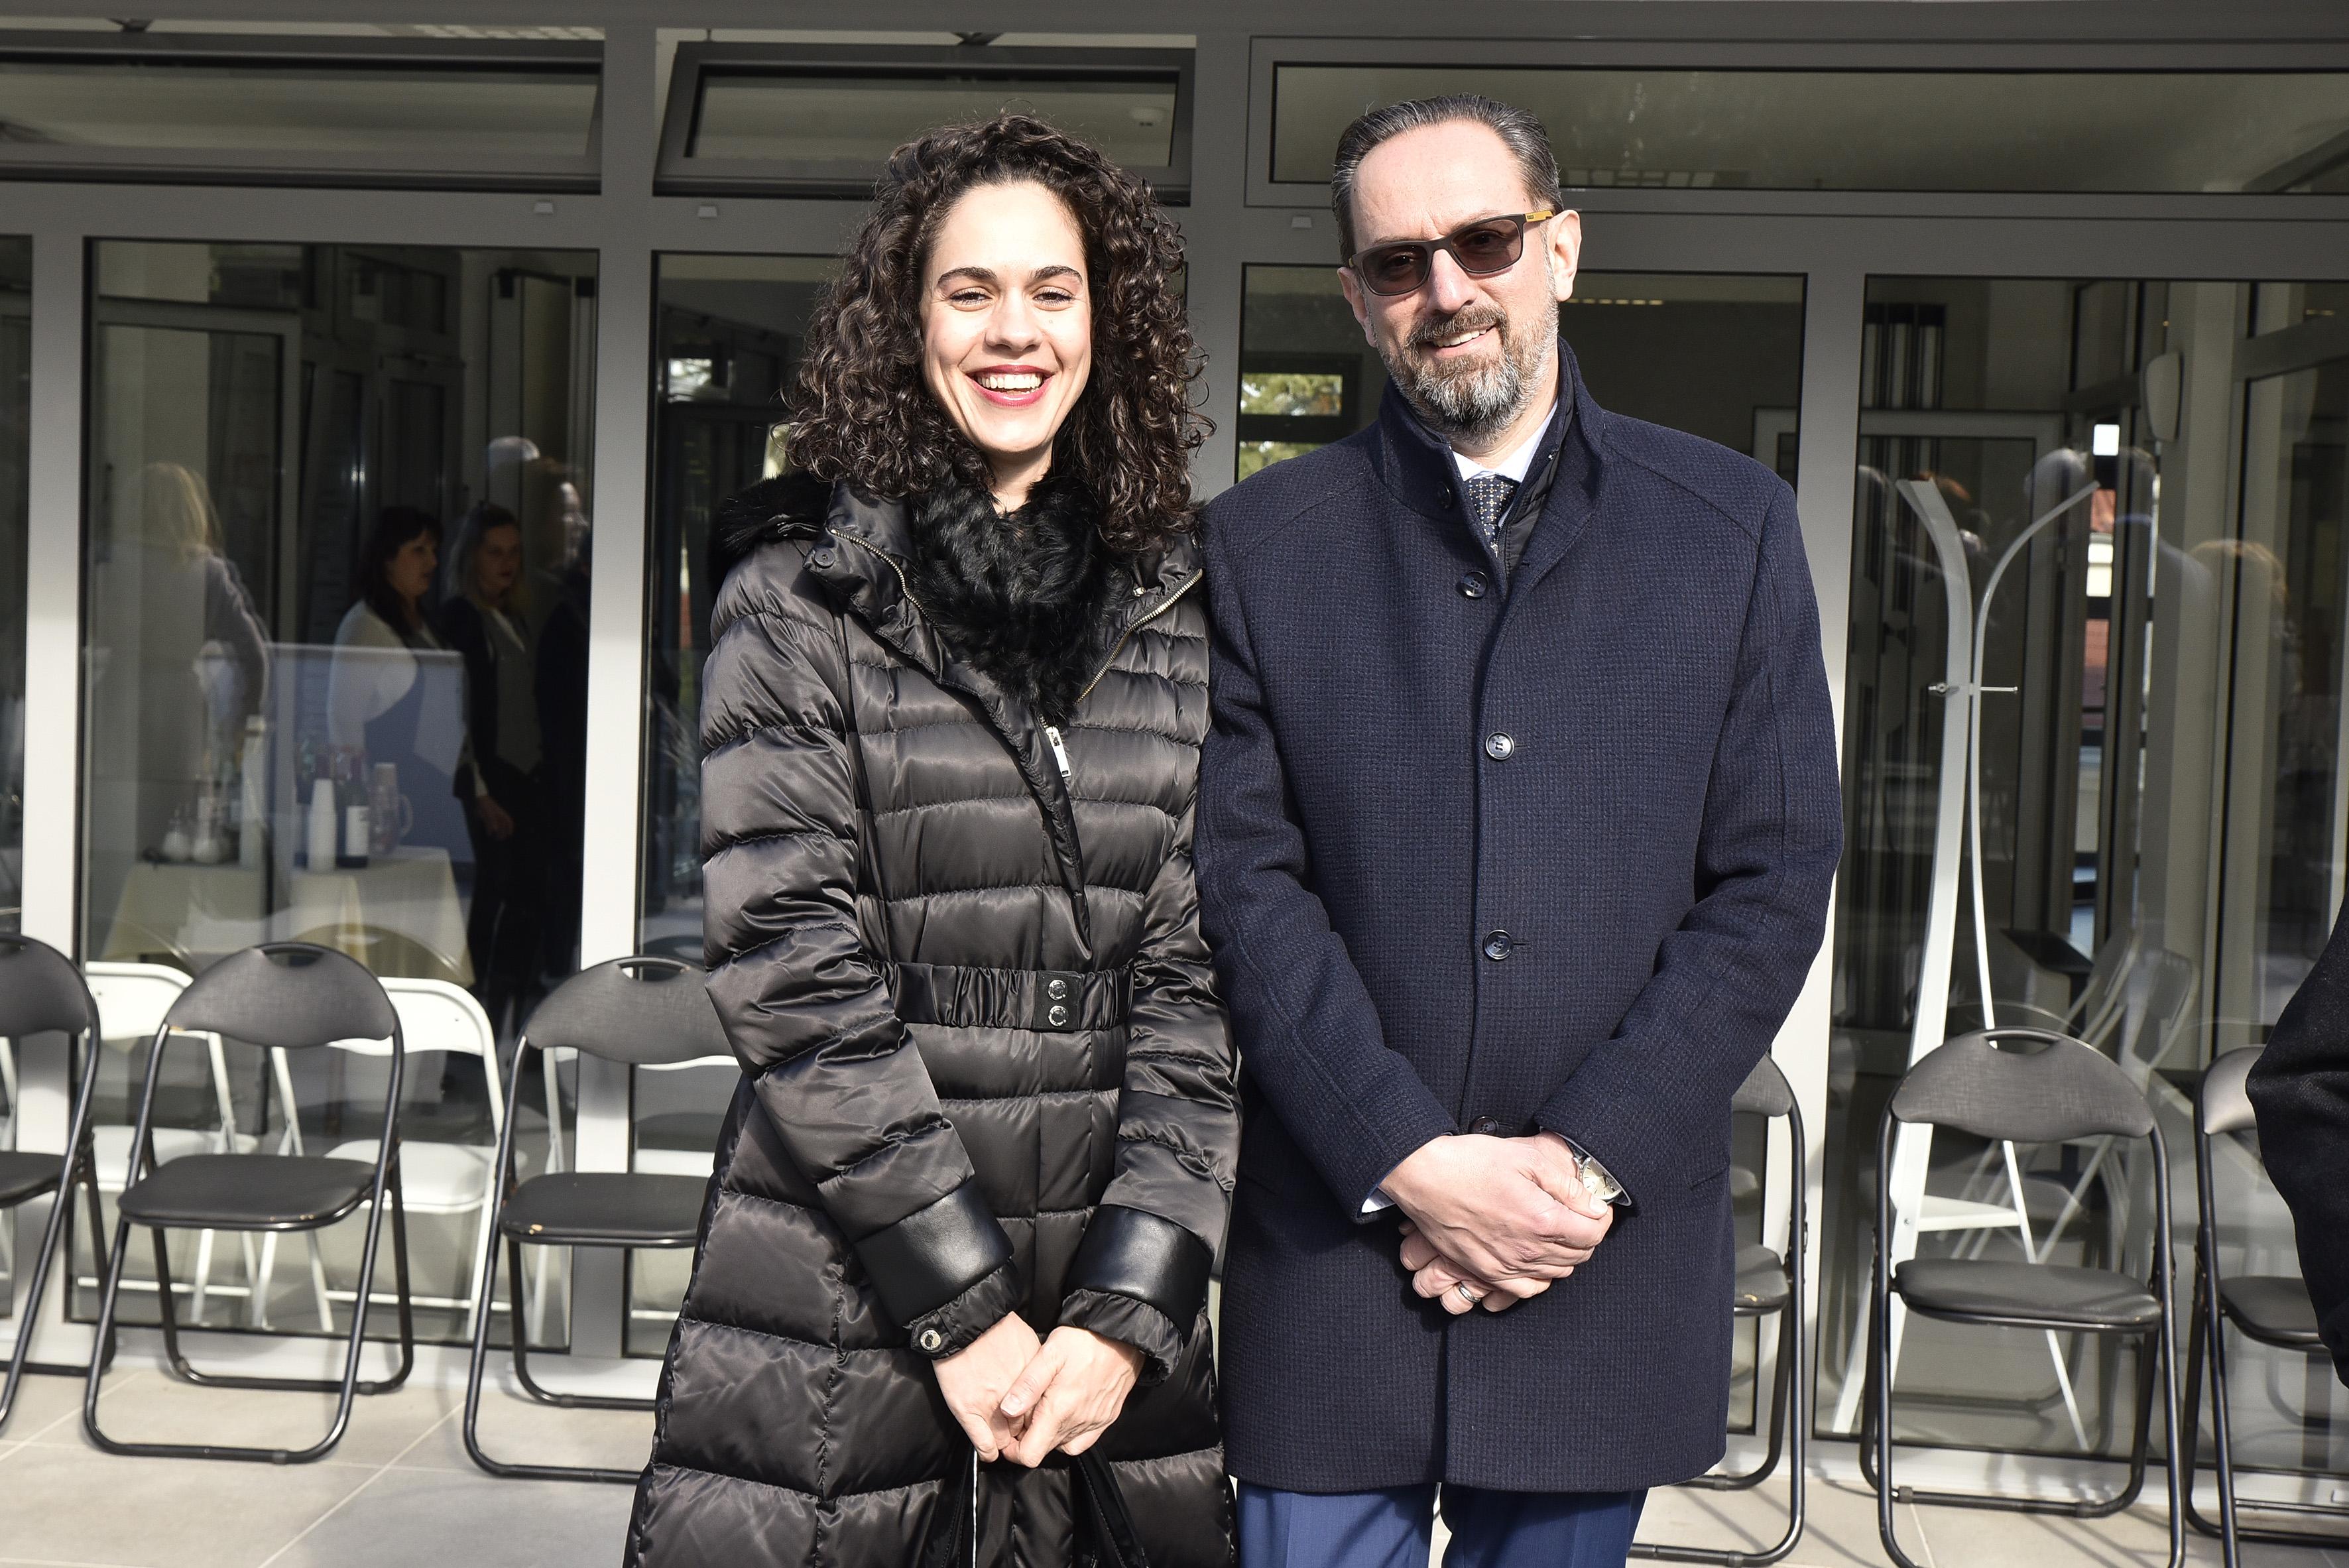 Ana Kučić i Kristijan Jurjako, snimio Walter SALKOVIĆ